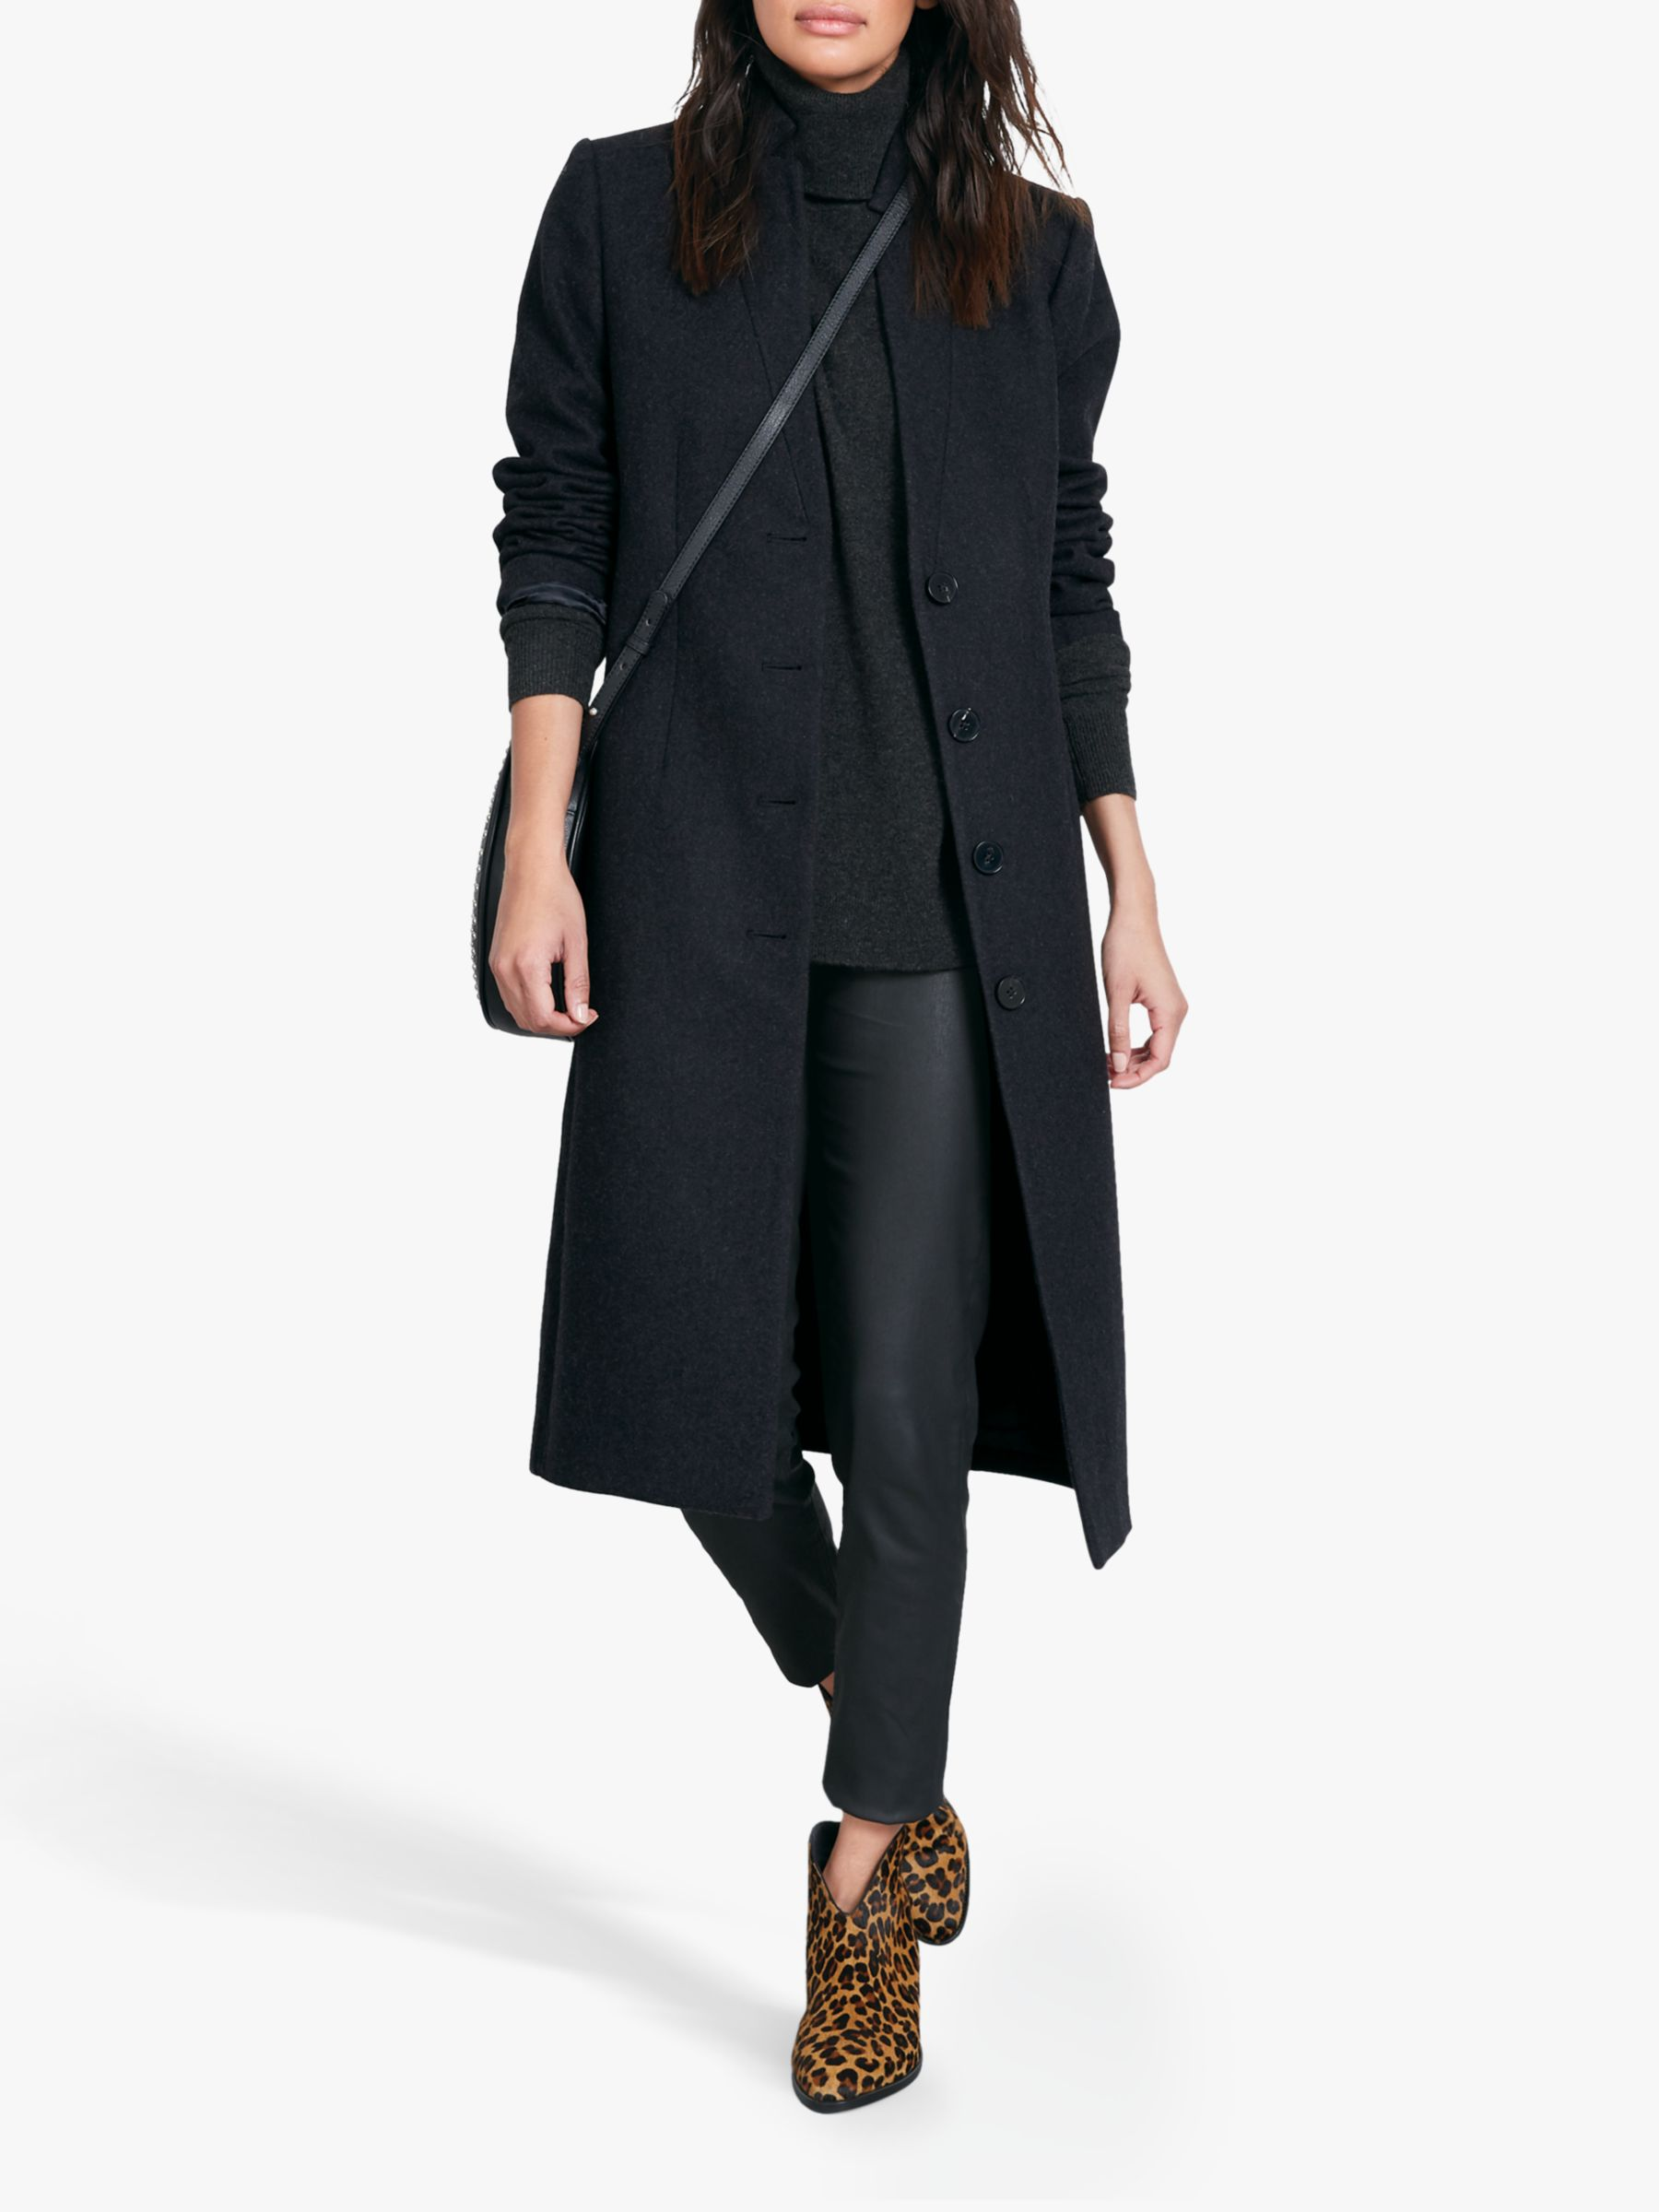 hush hush Isadora Tailored Coat, Charcoal